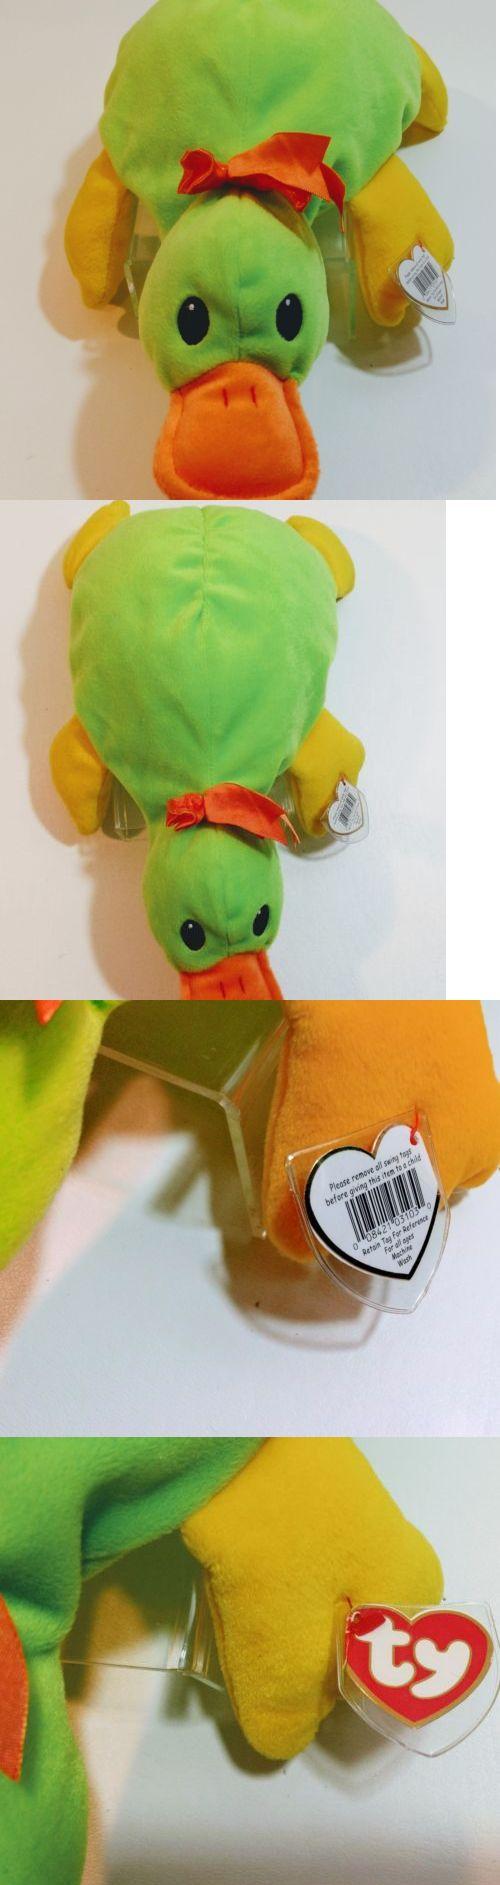 97b31ed2267 Pillow Pals 1633  Ty Pillow Pals Paddles The Platypus 1998 Plush Stuffed  Toy -